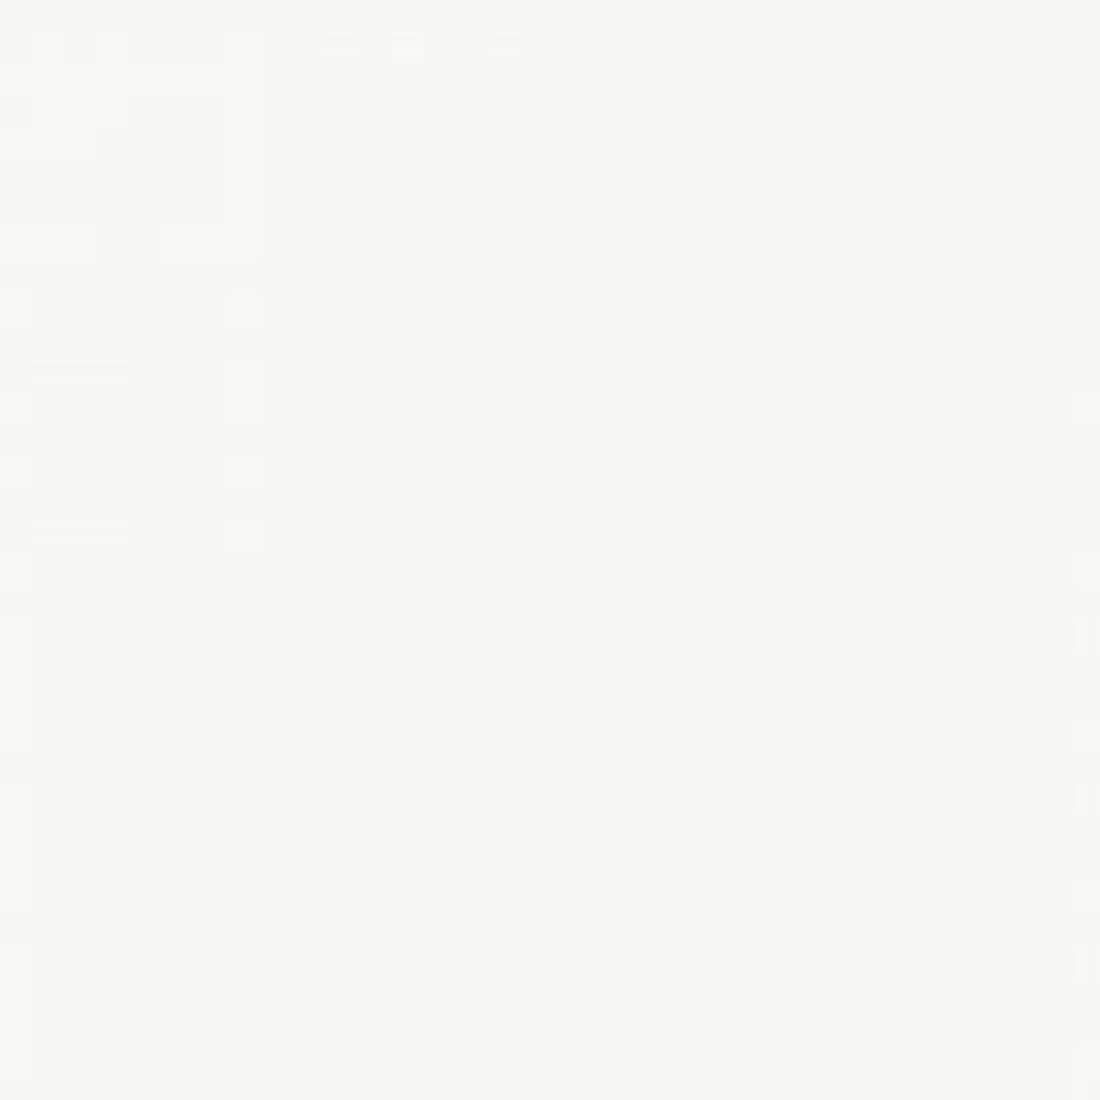 Porcelanato Polido 61 x 61 New Home White Embramaco Ref: P62060